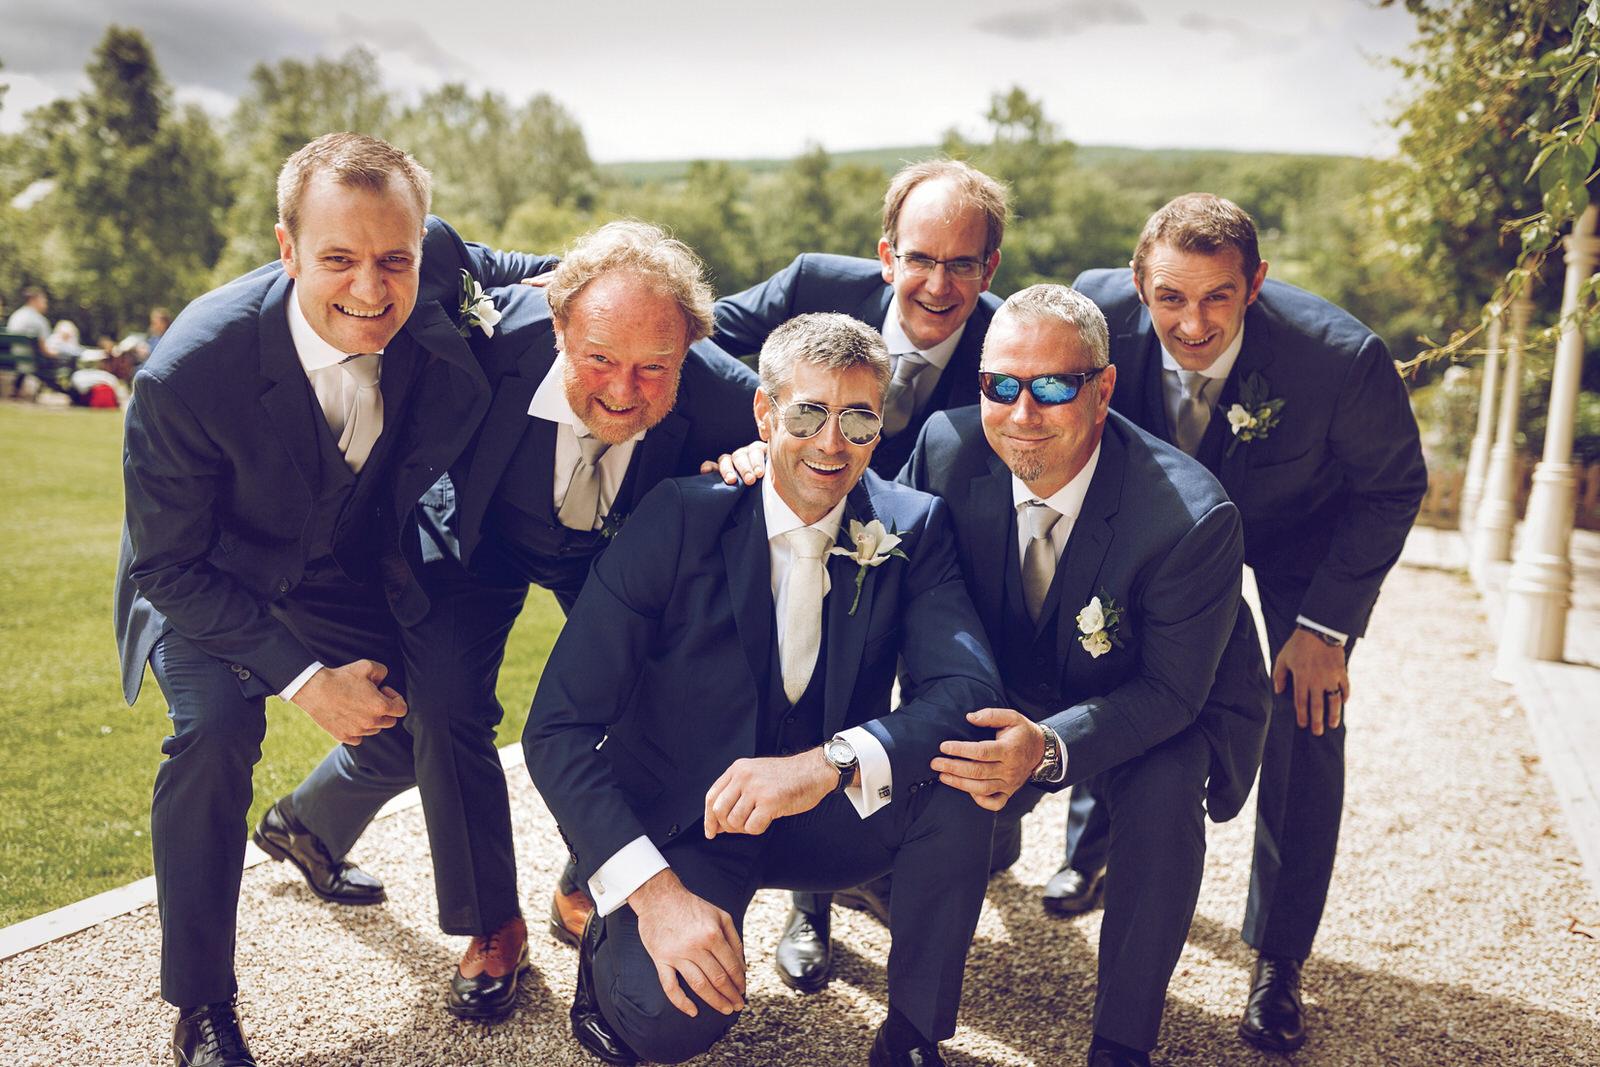 Brooklodge-wicklow-wedding-photographer_013.jpg